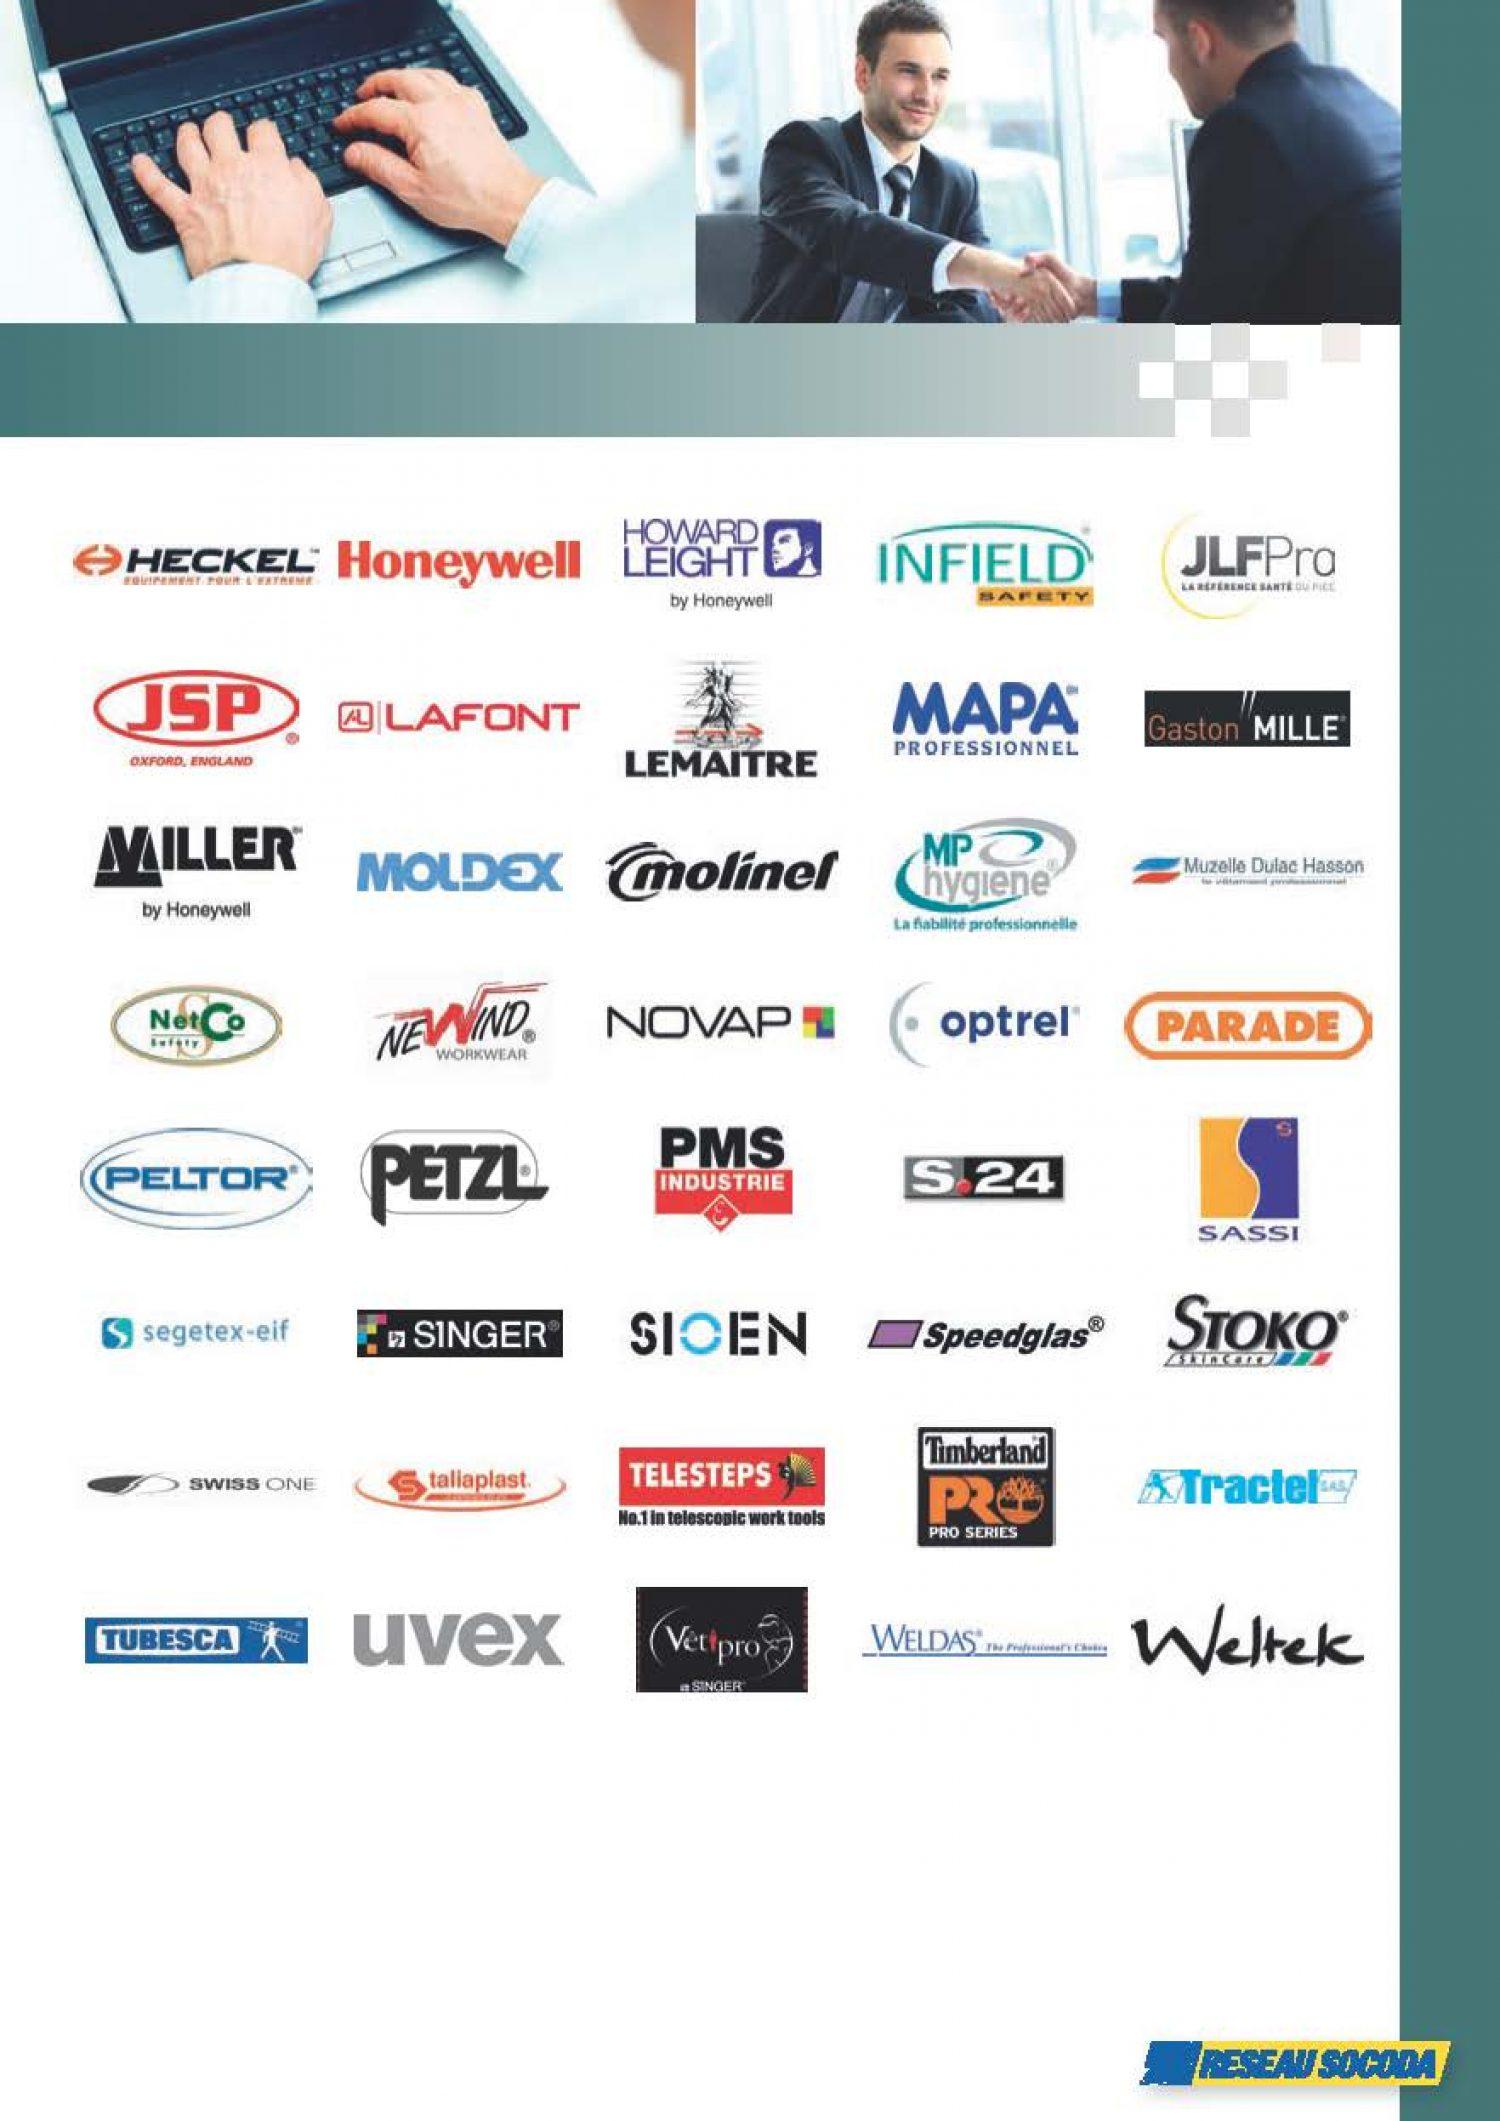 Guide Securite au Travail 2014 HDpdf_Page_39